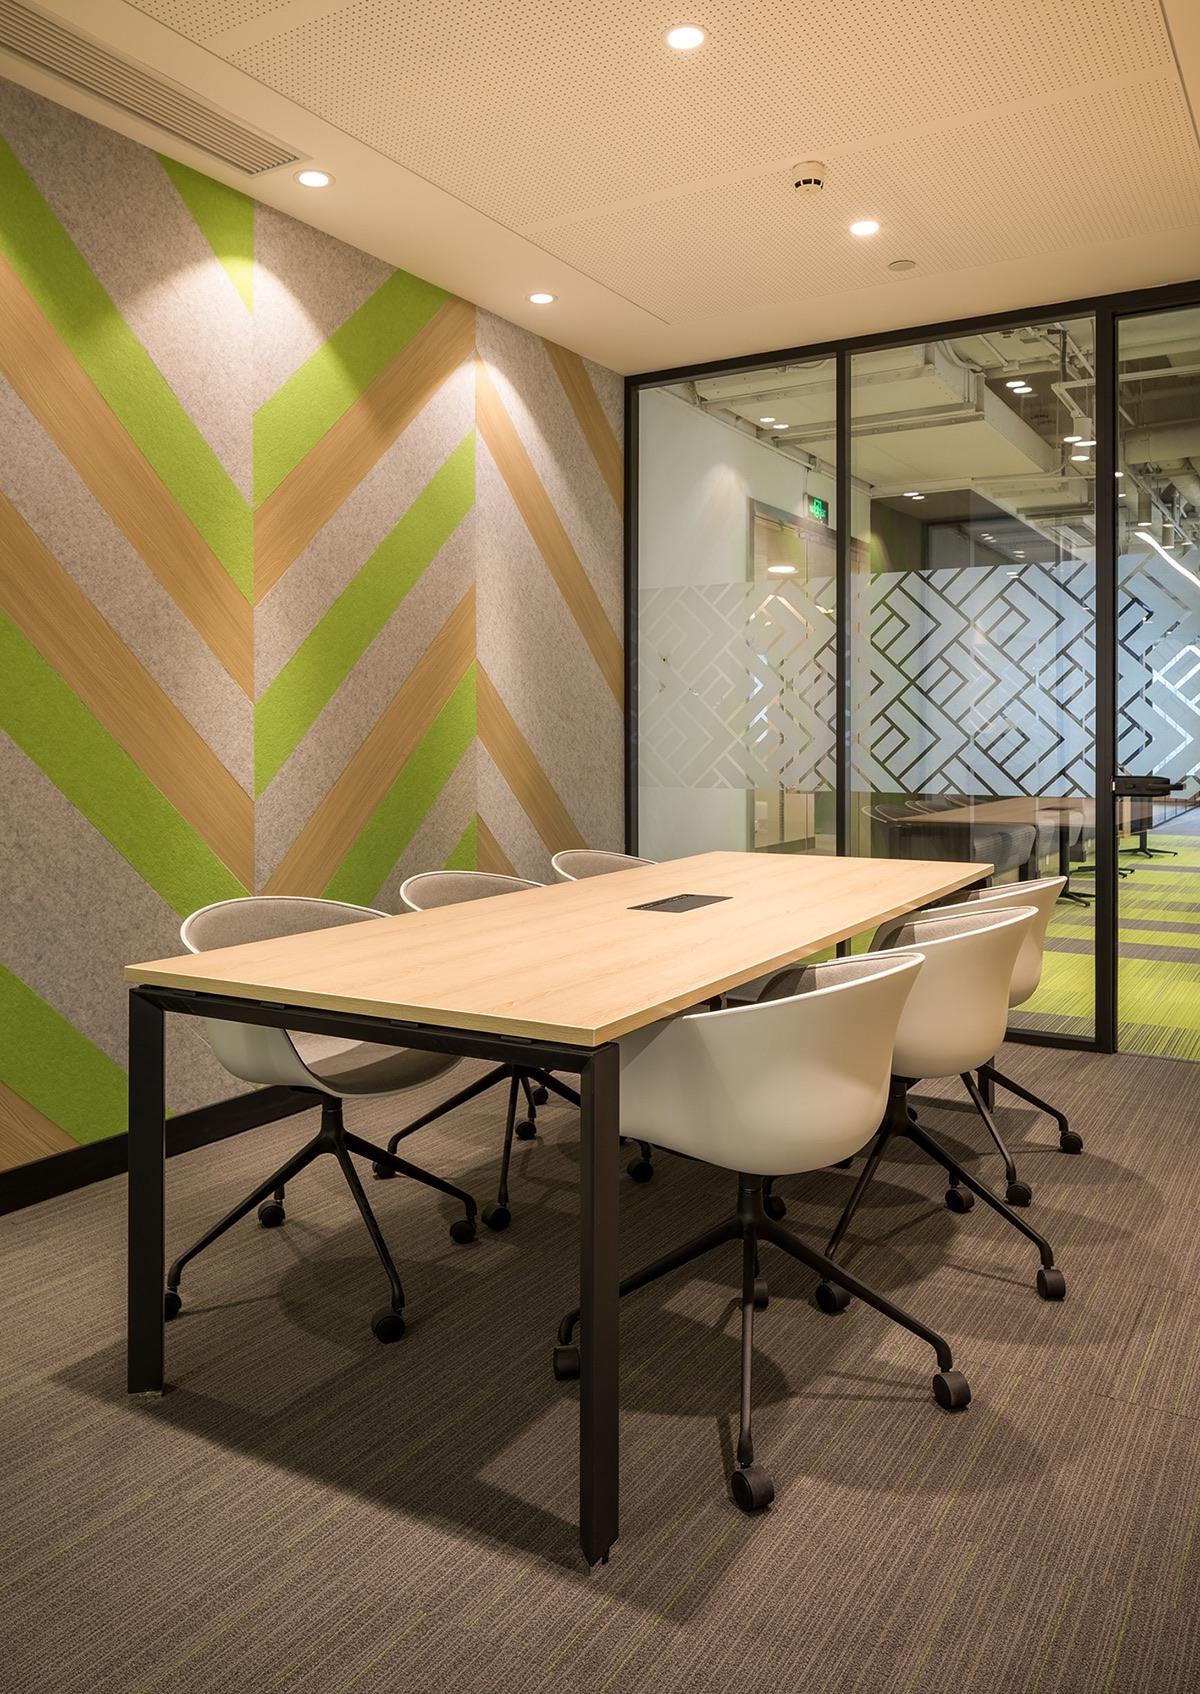 zespri-image-shanghai-office-4